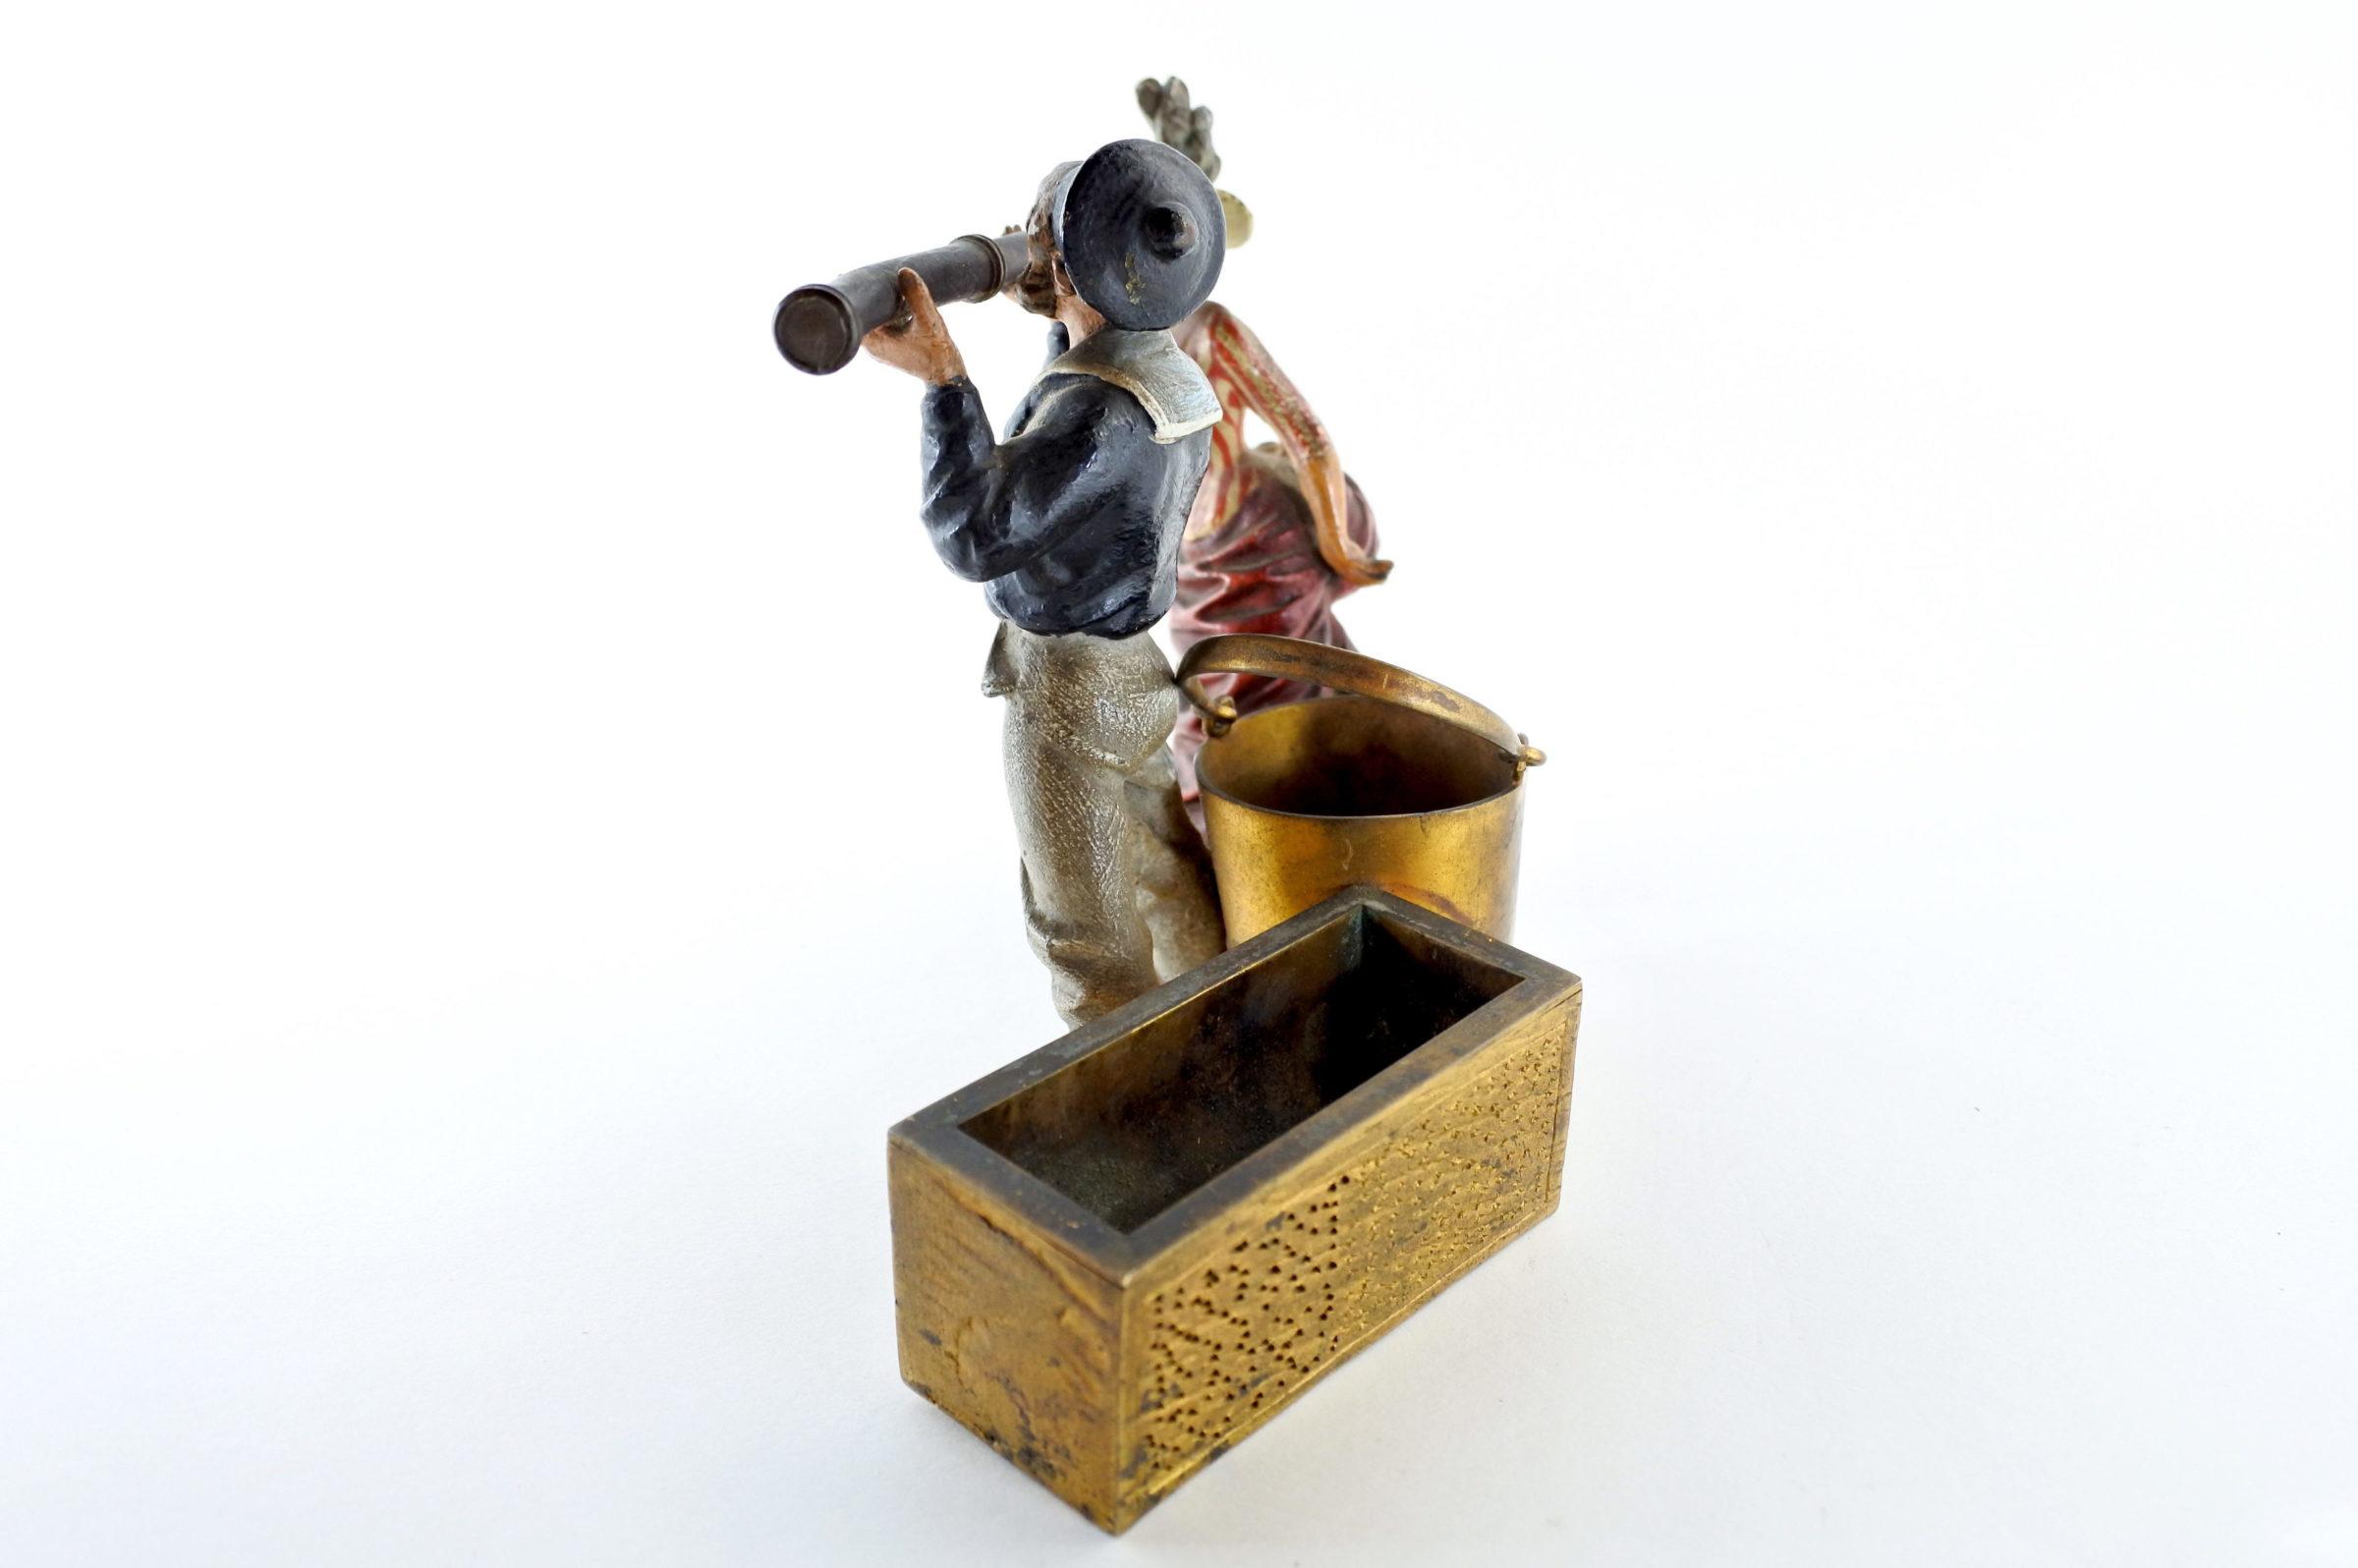 Bronzo di Vienna policromo - Donna con cannocchiale e marinaio - 4